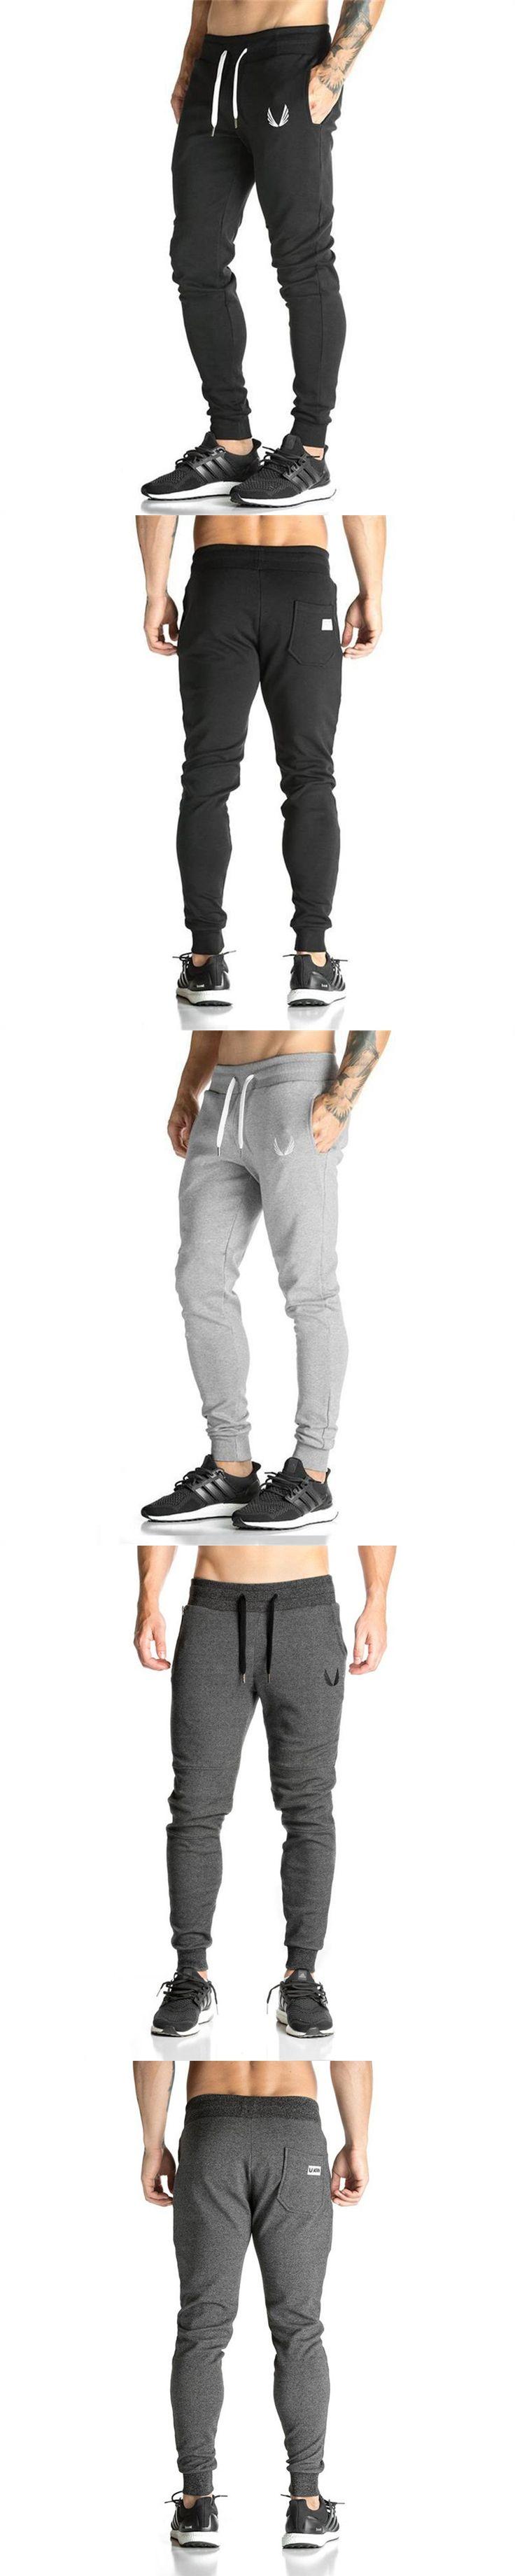 Men Sweatpants 2017 Men Pants Elastic cotton Mens Fitness Workout Pants skinny Trousers Jogger Pantalon Homme Gyms Clothing XXL